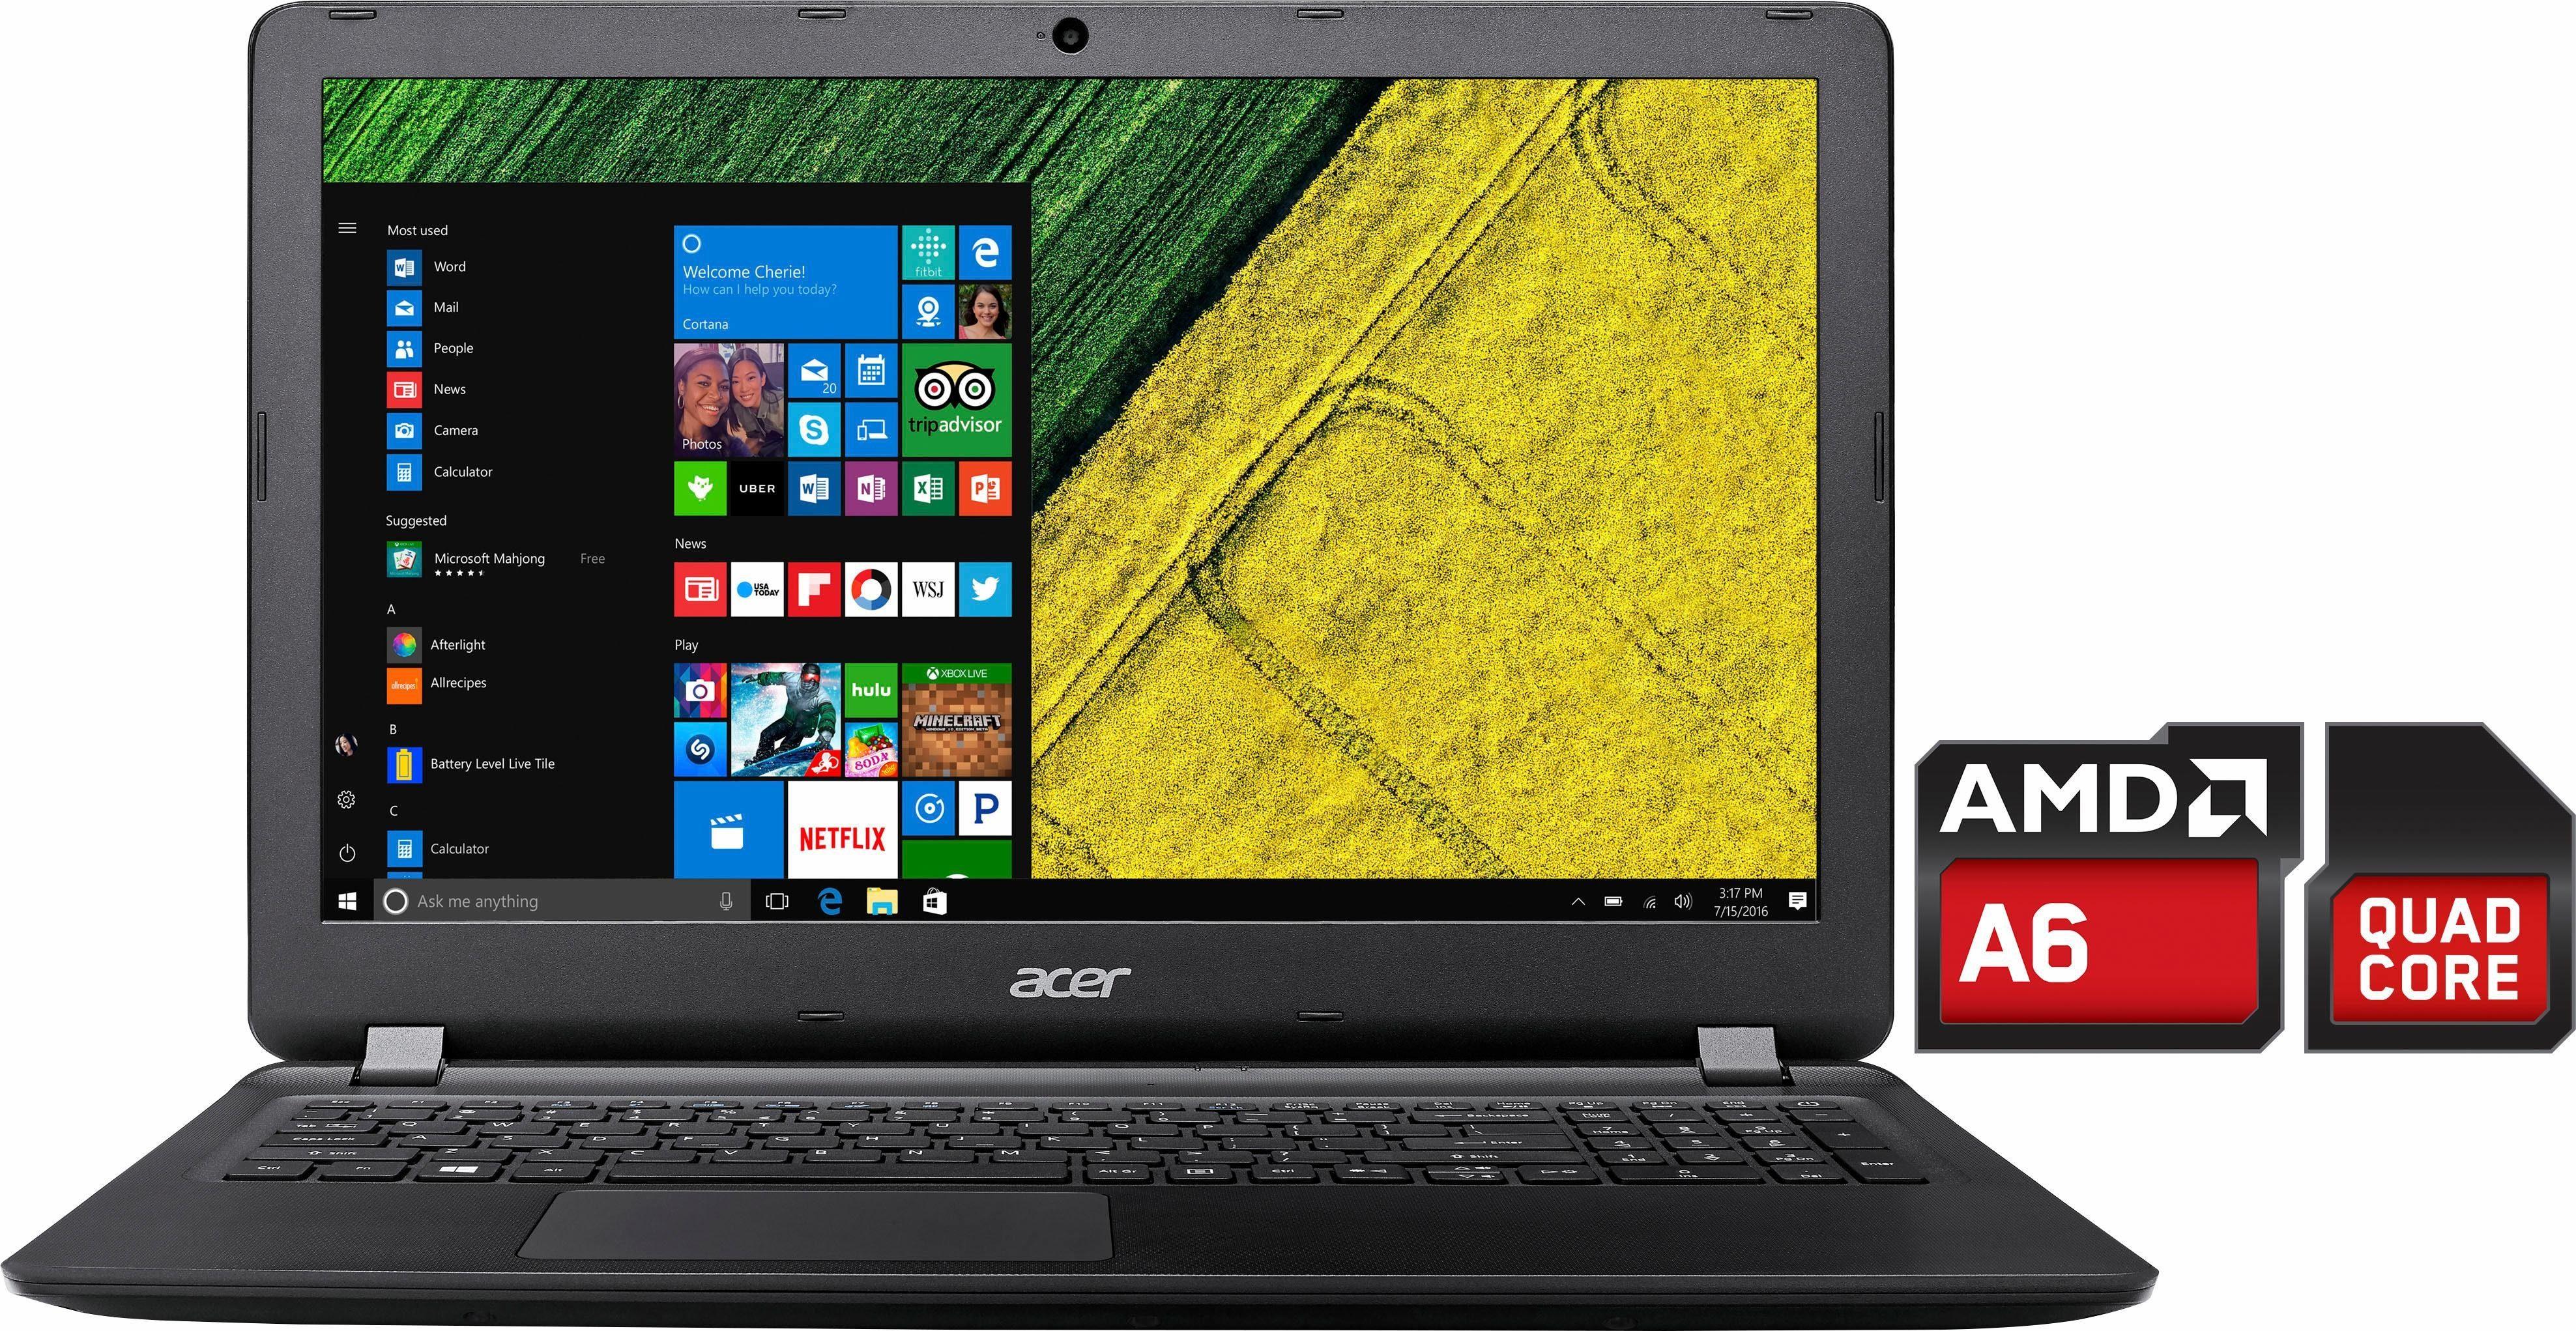 Acer Aspire ES1-523-67SK Notebook, AMD A6, 39,6 cm (15,6 Zoll), 1000 GB Speicher, 4096 MB DDR3L